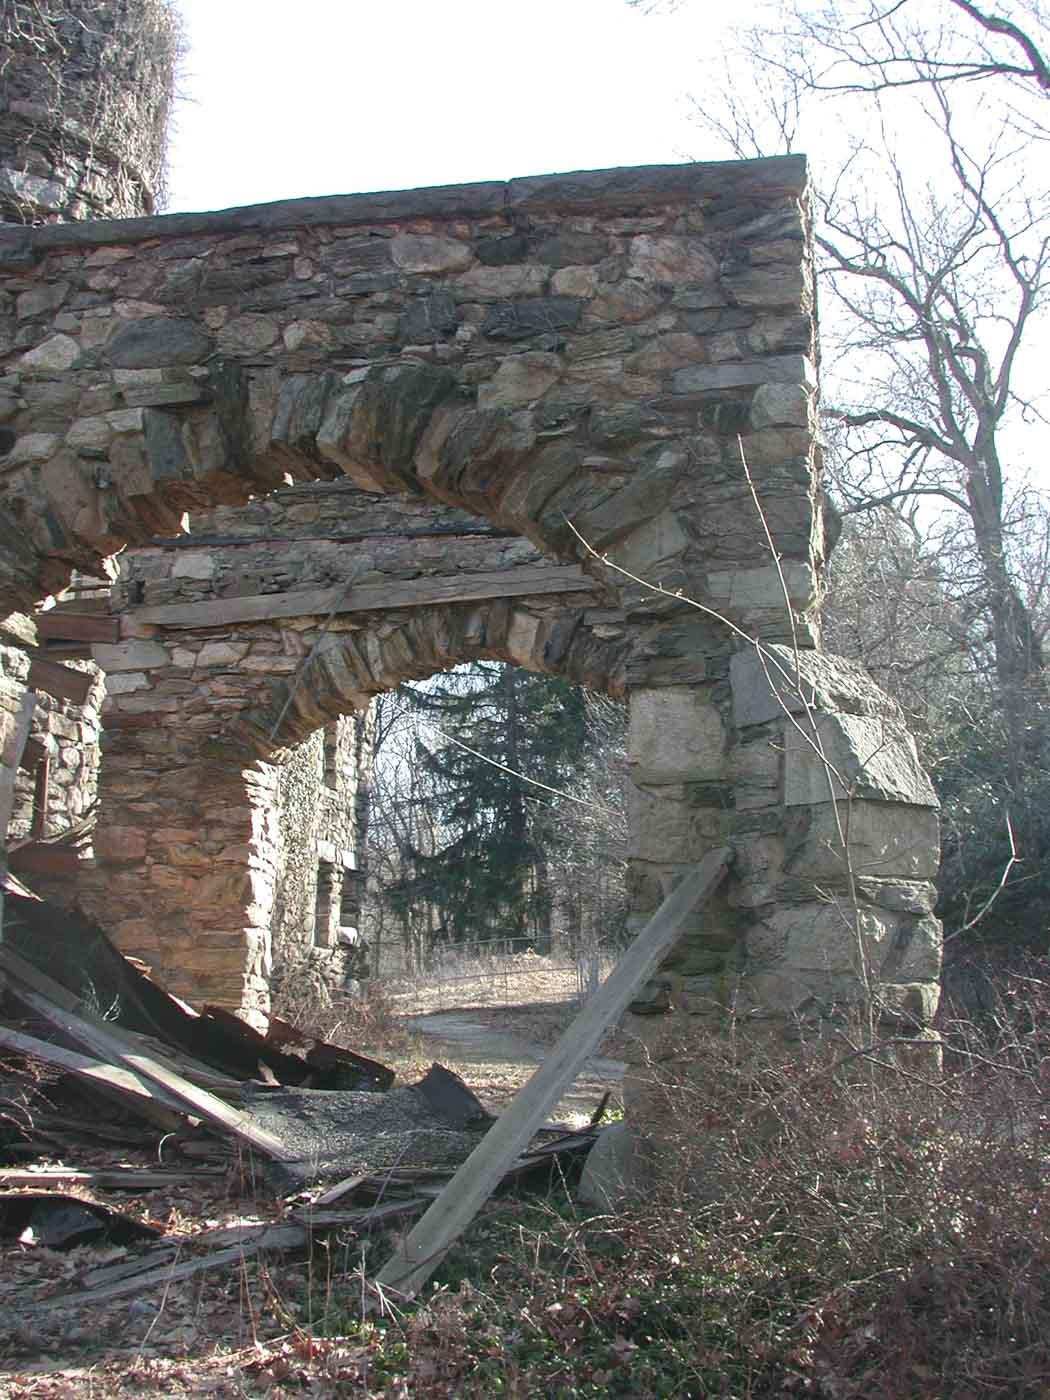 hearthstone-castle-portico-roof-cave-in-stone-still-standing